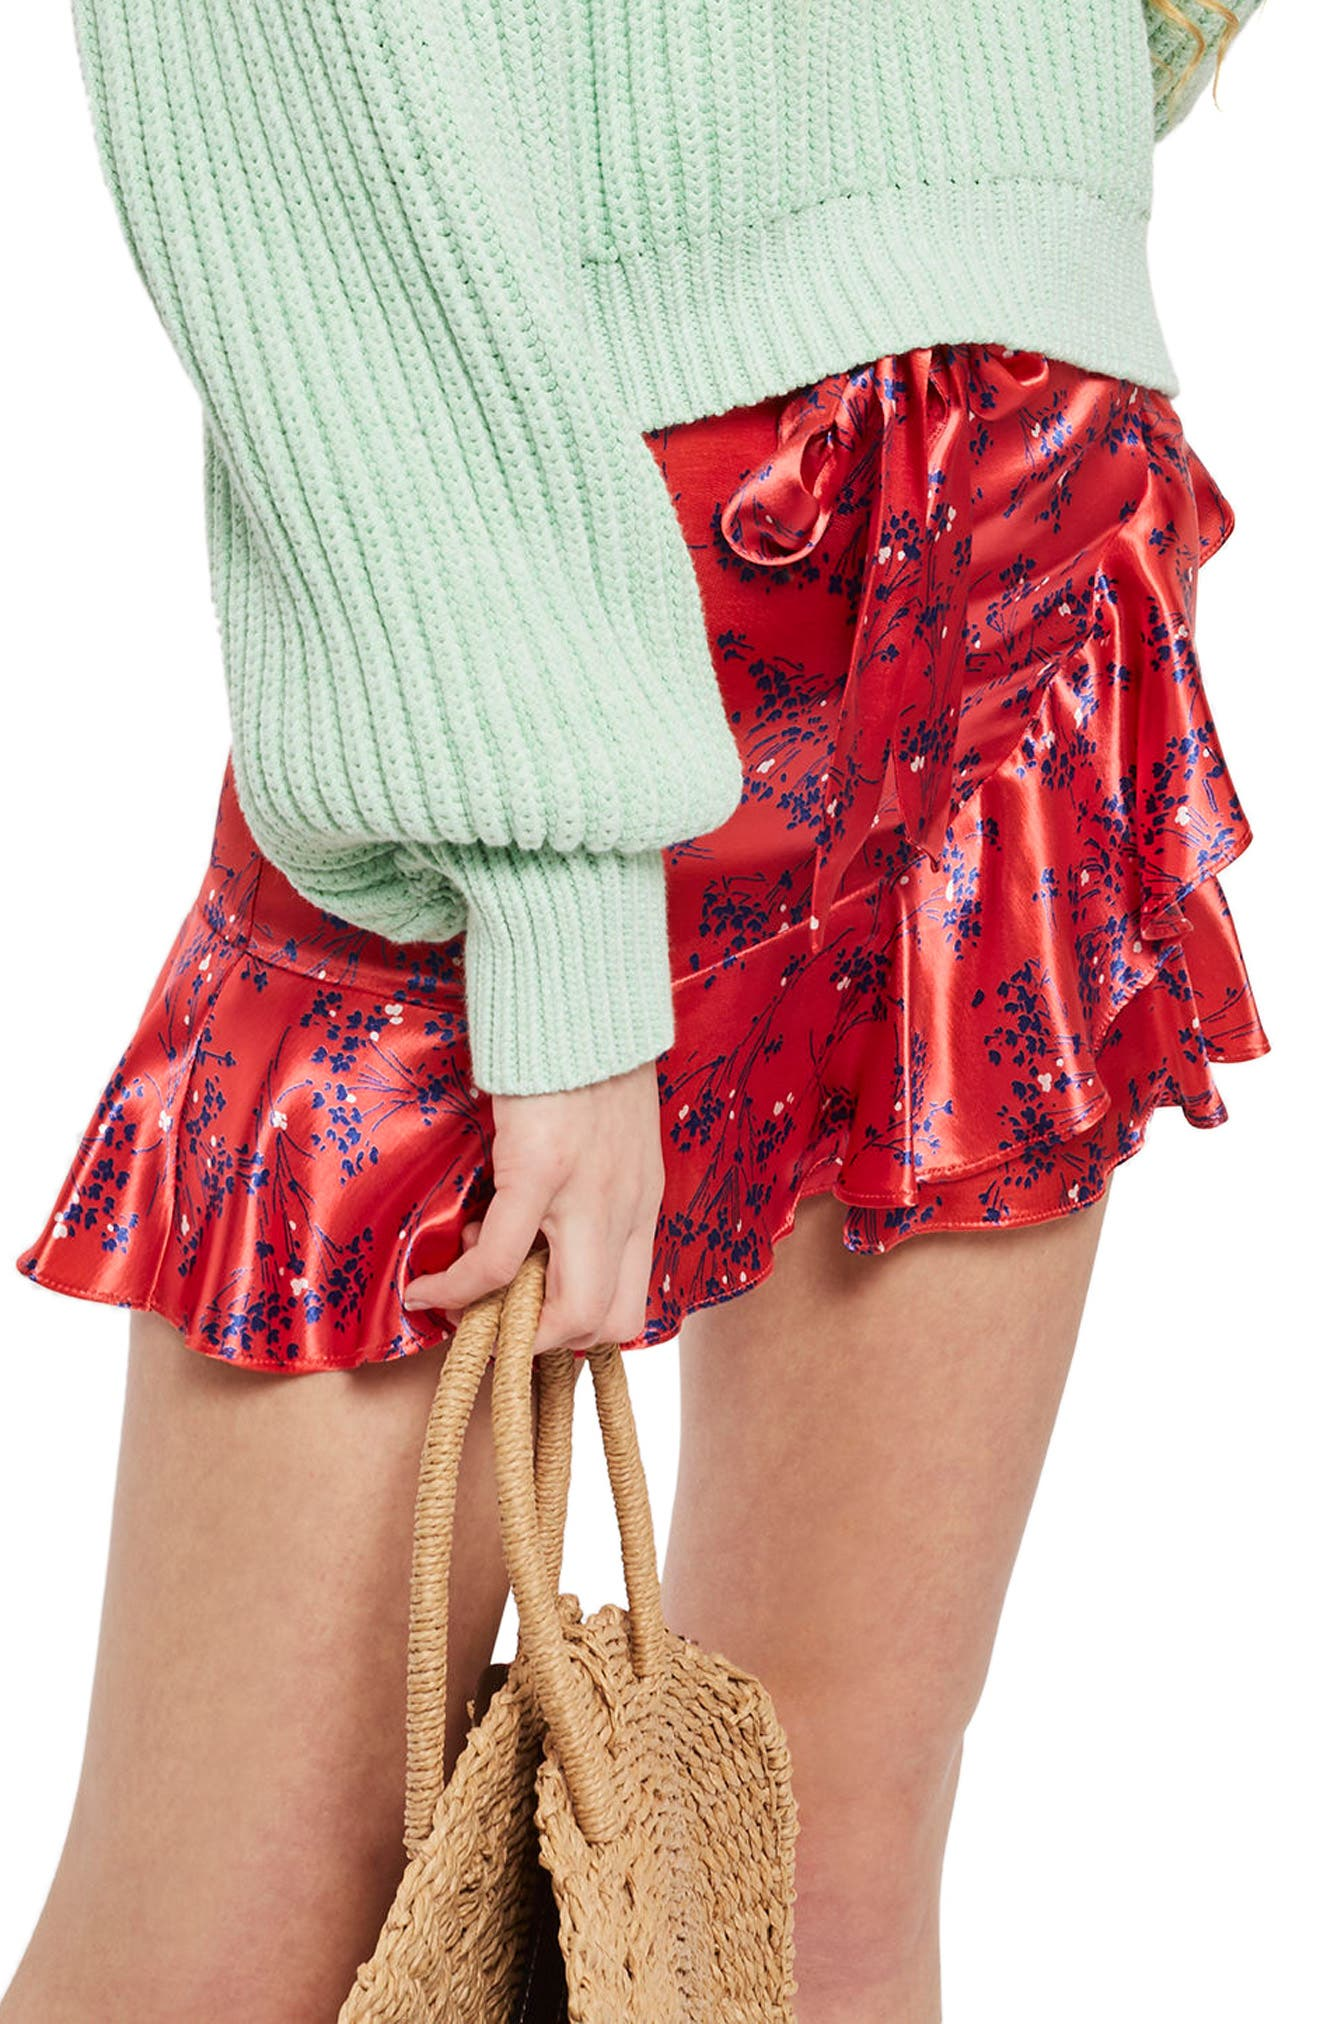 Topshop Floral Print Miniskirt